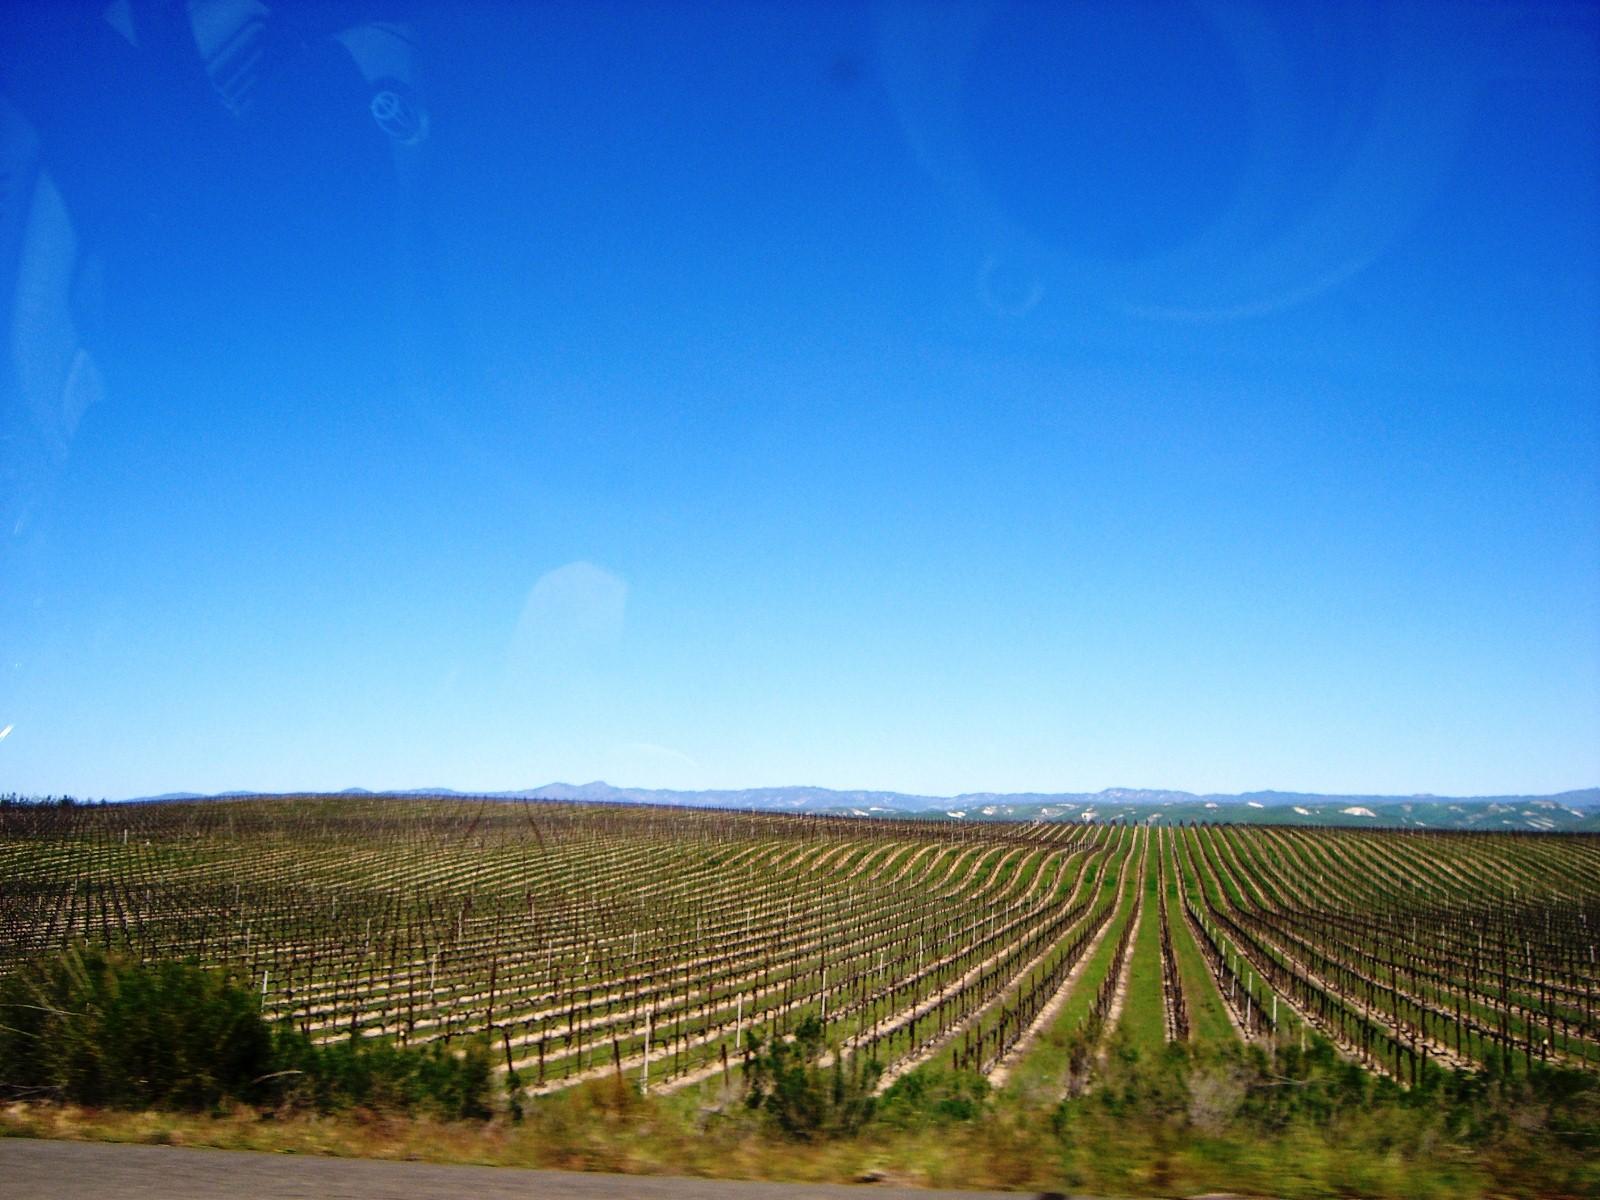 Click image for larger version  Name:vineyards1.JPG Views:63 Size:427.1 KB ID:59387